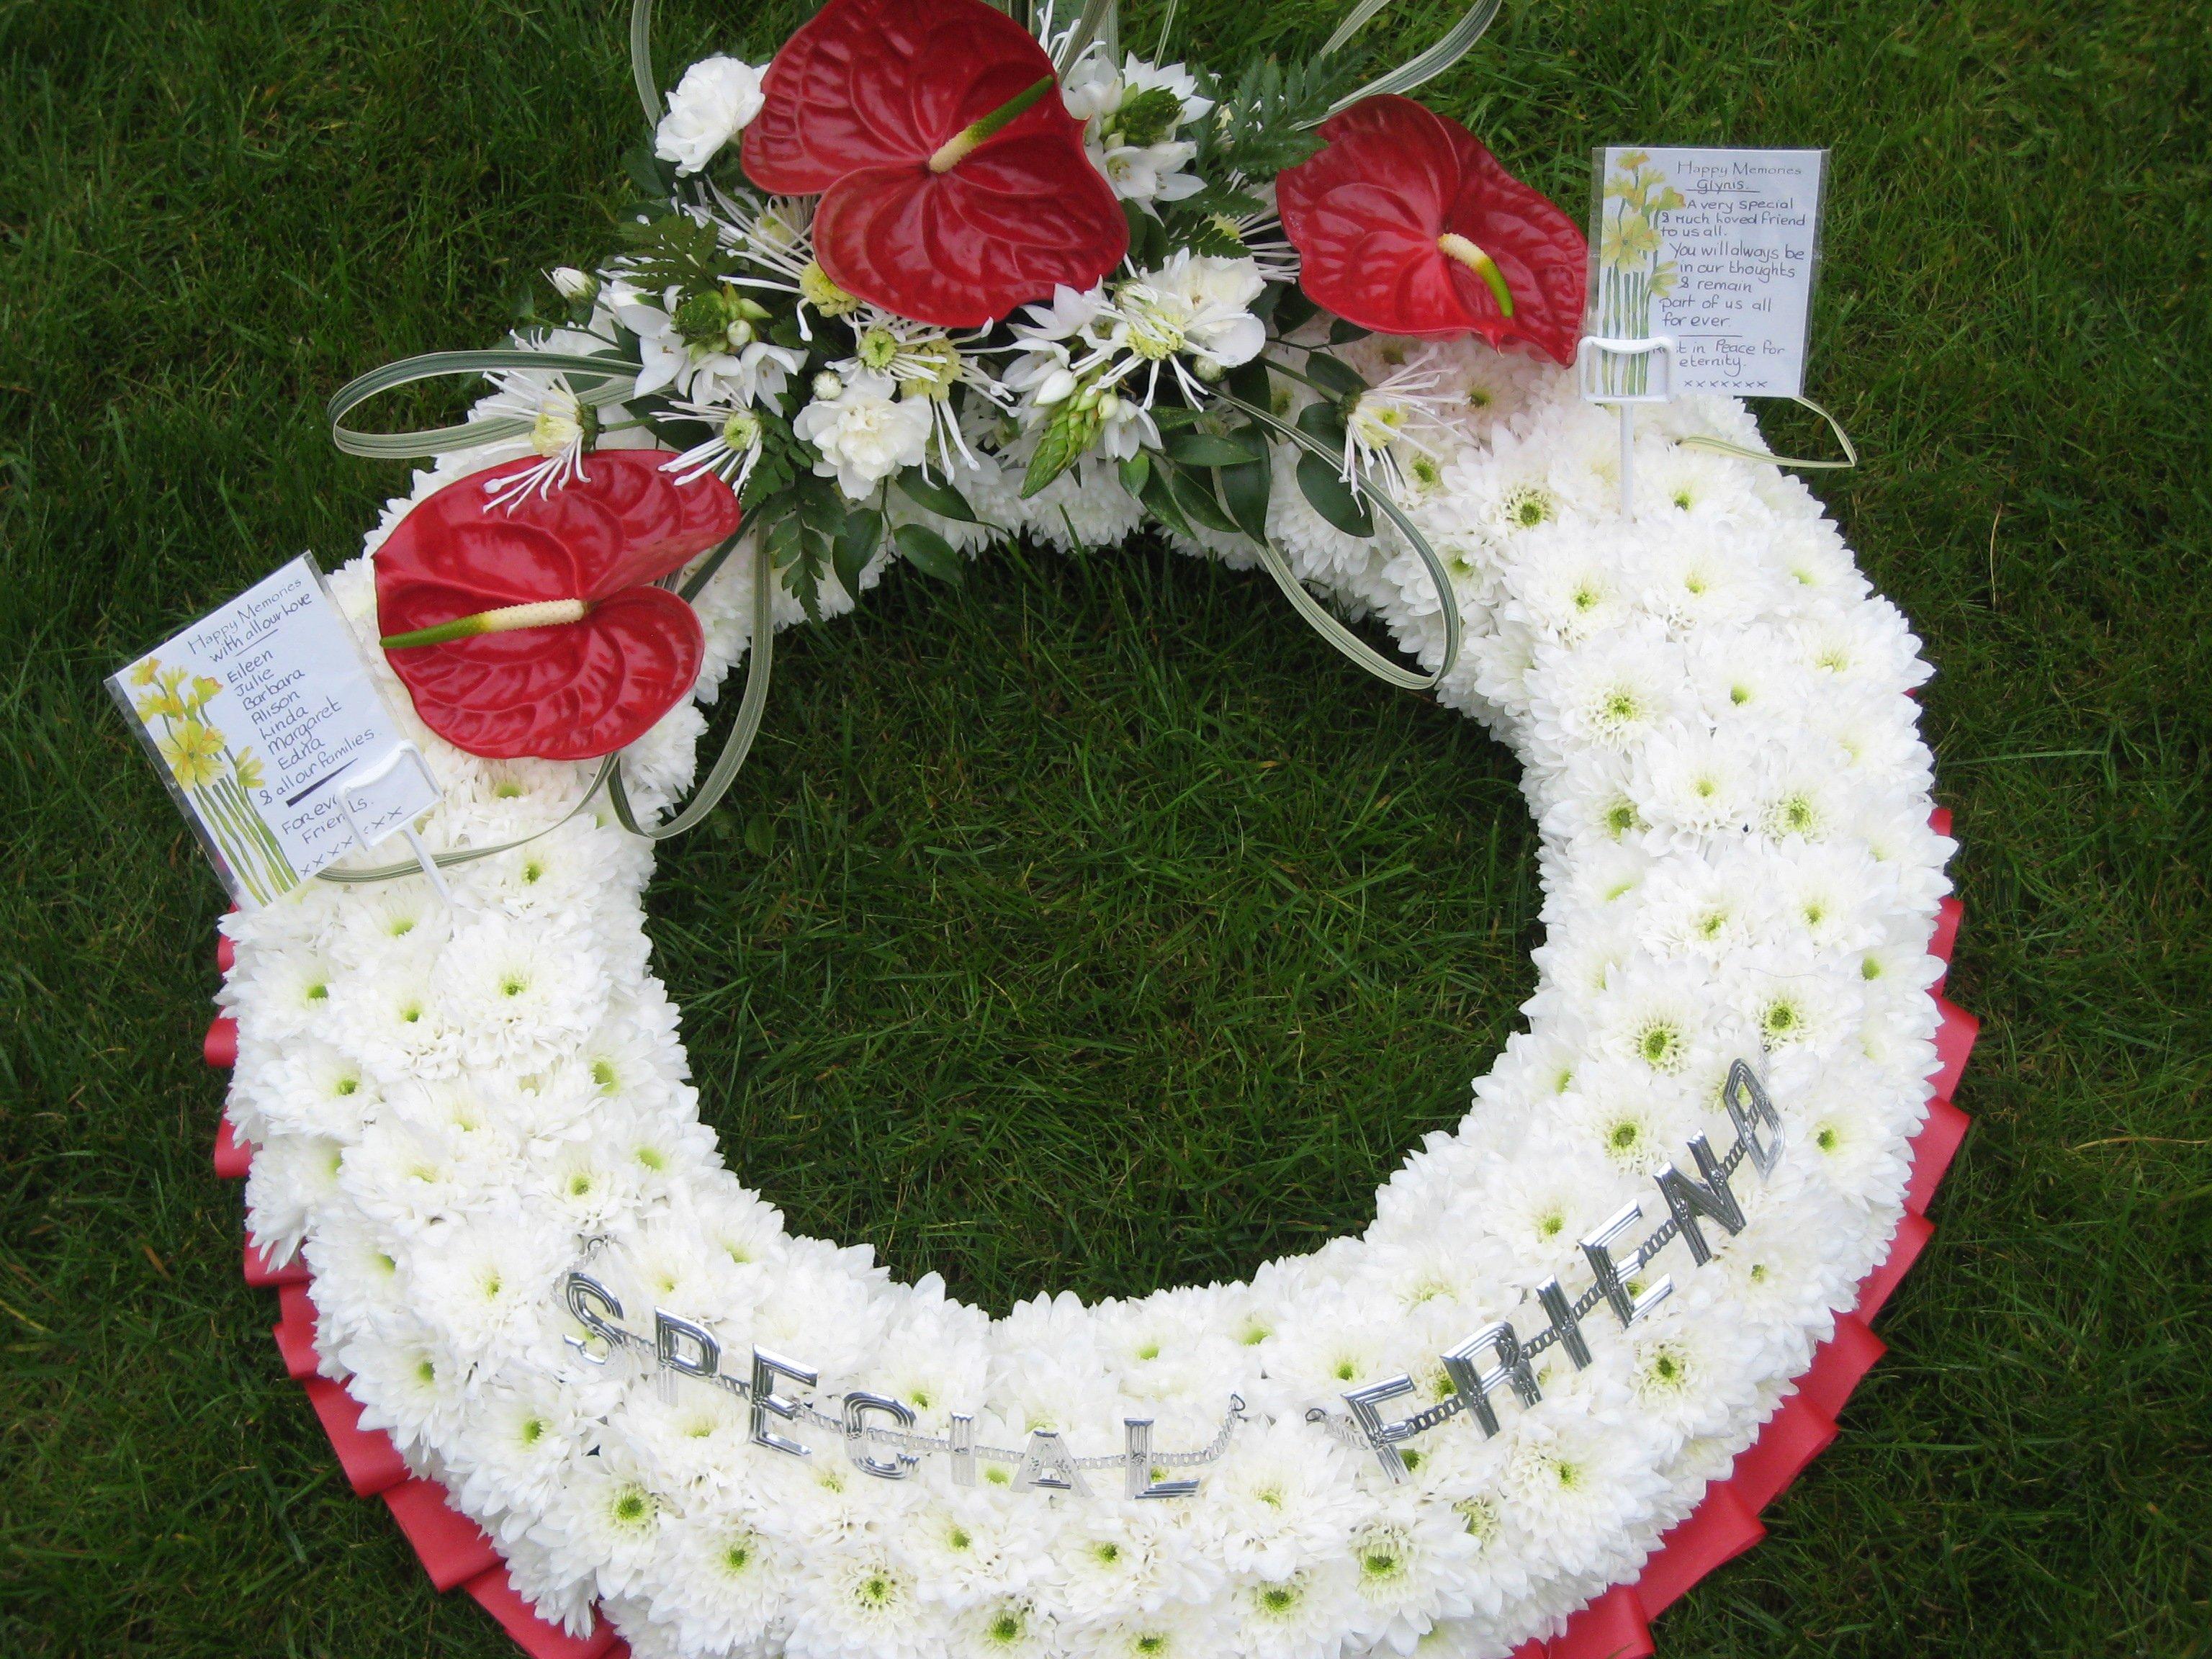 Jacaranda Flowers Funeral Tributes Wreaths Teardrop And Posy